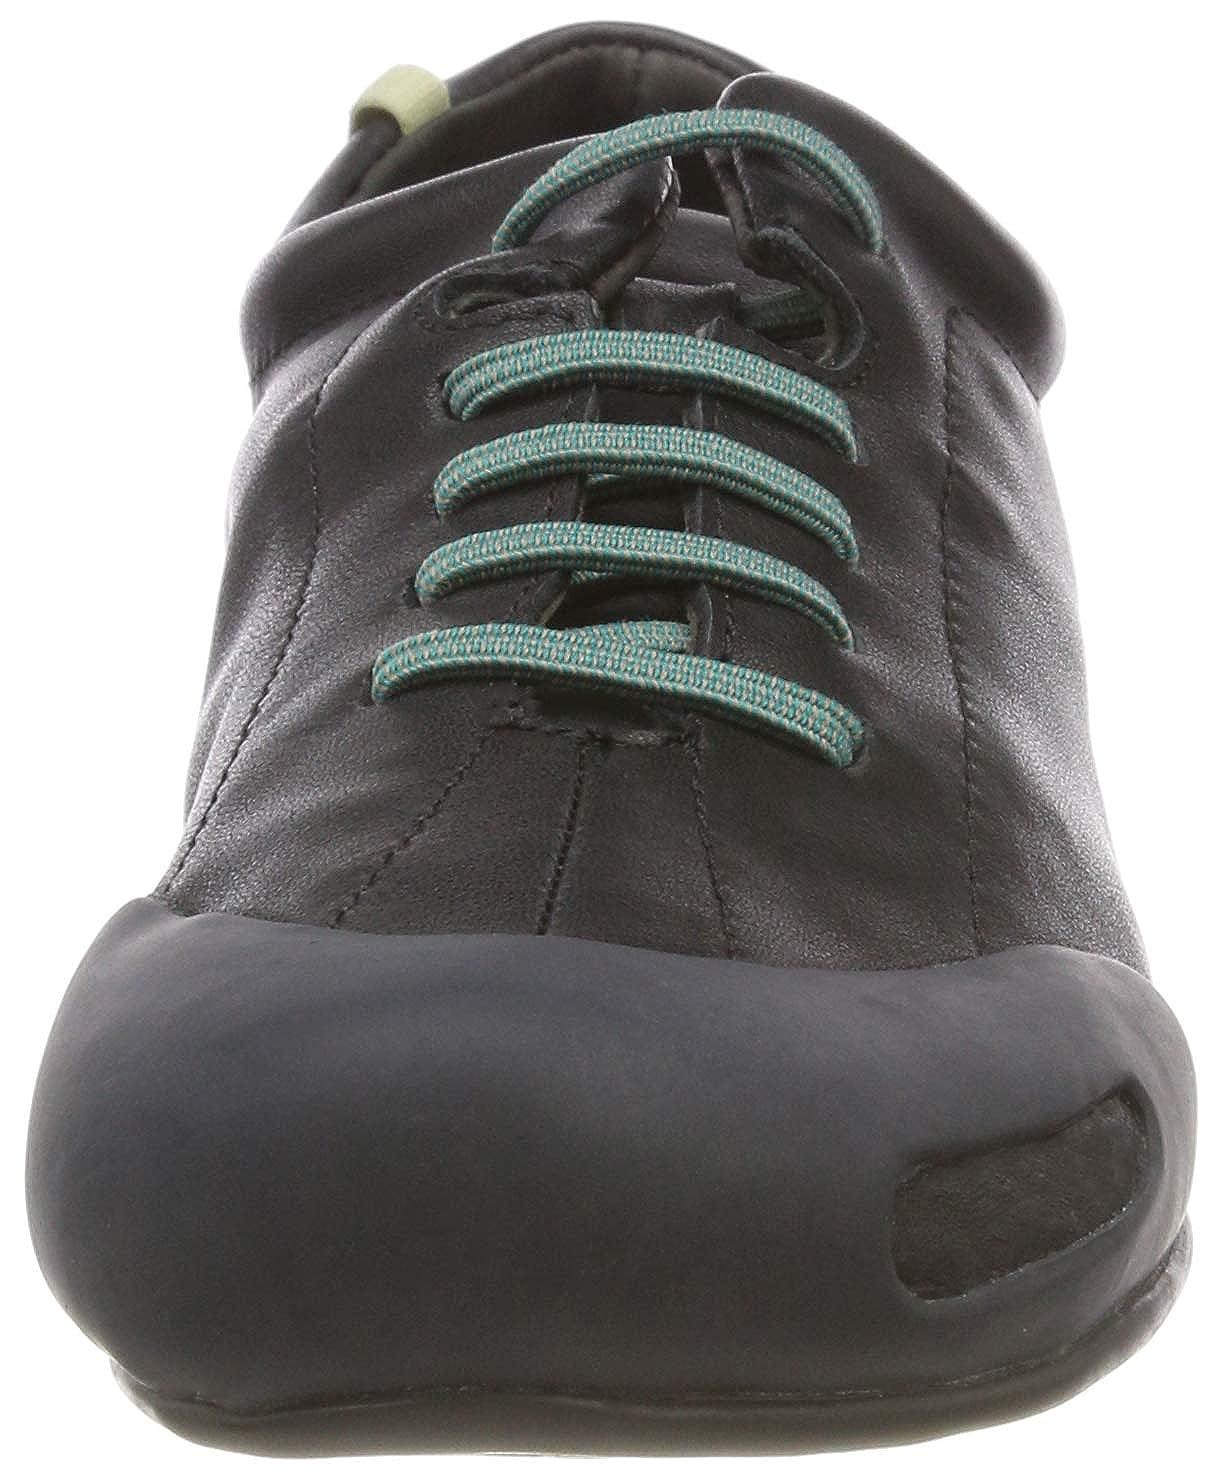 CAMPER, Peu  Peu CAMPER, Senda Damen Sneakers Schwarz 0d3b1a